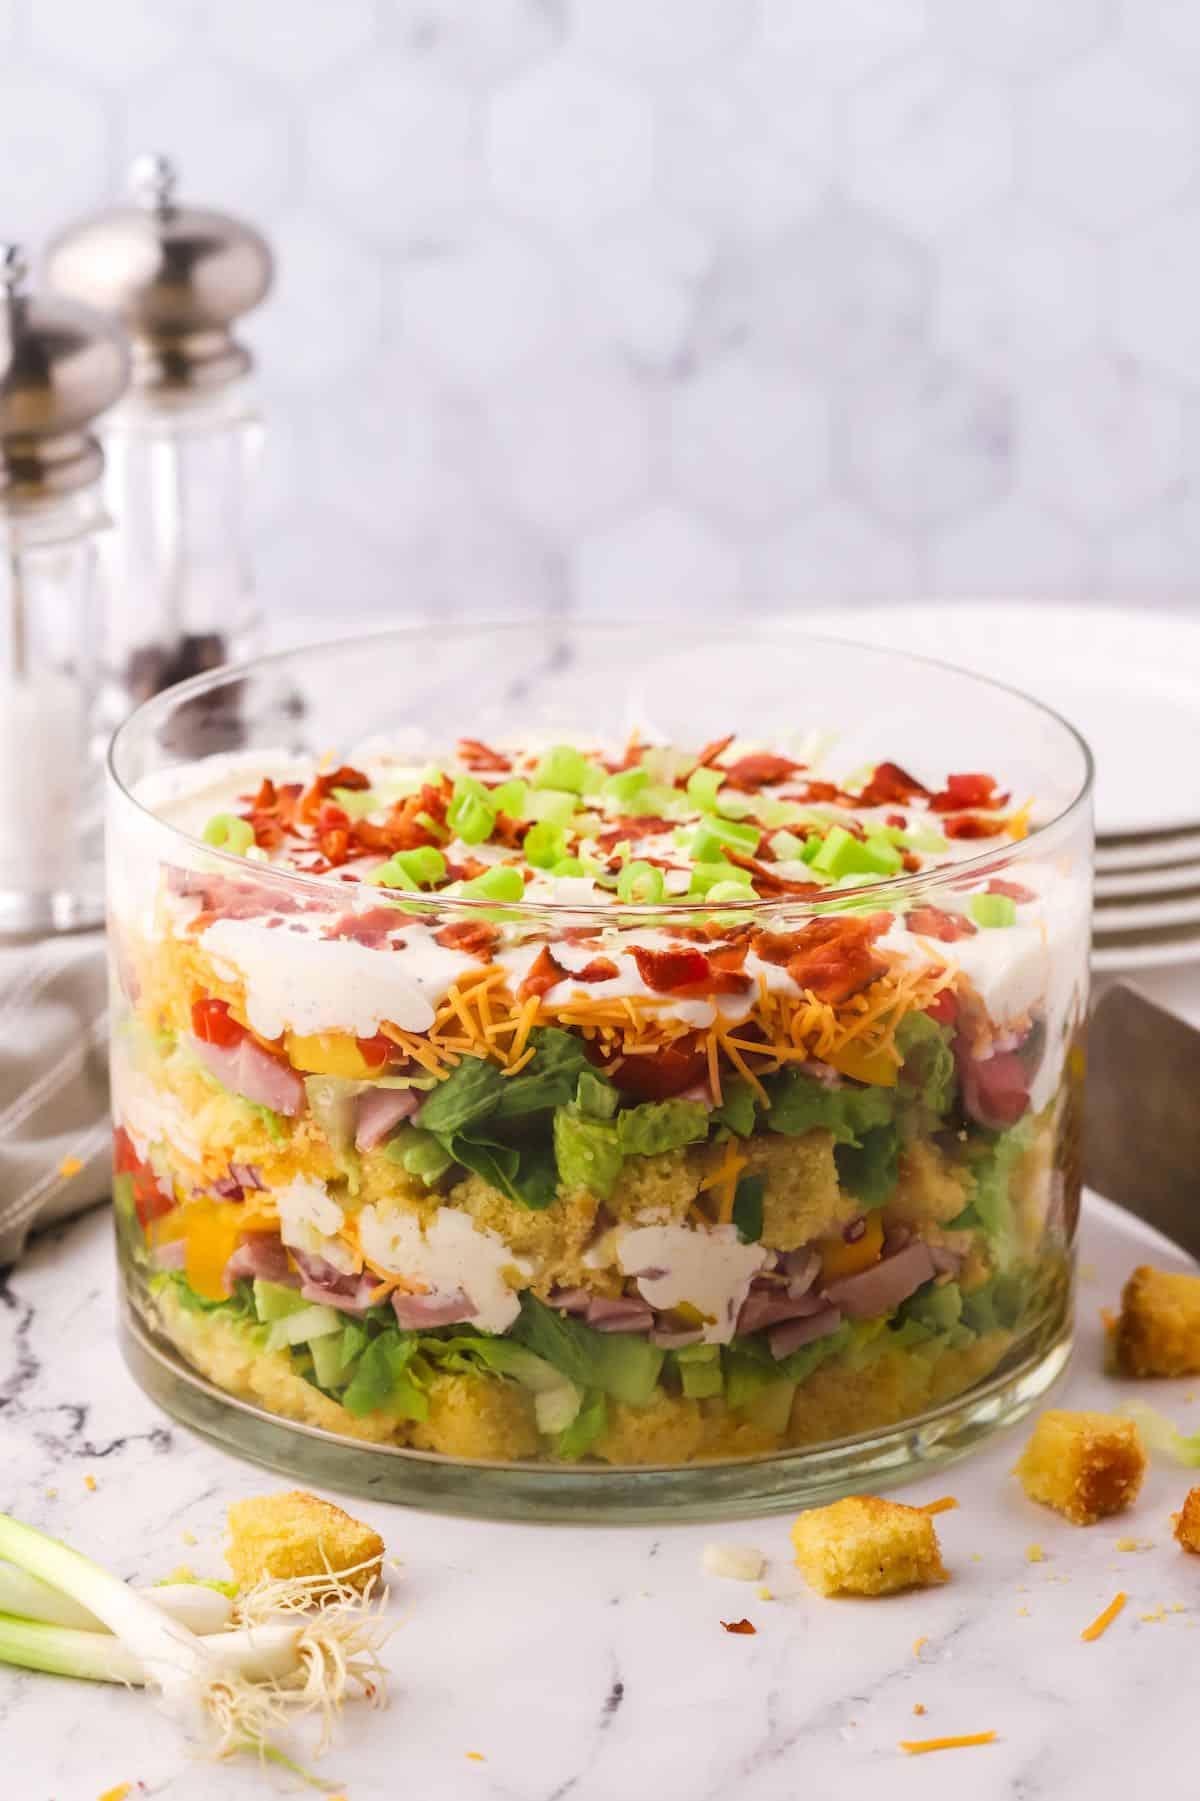 Layered cornbread salad in a trifle dish.